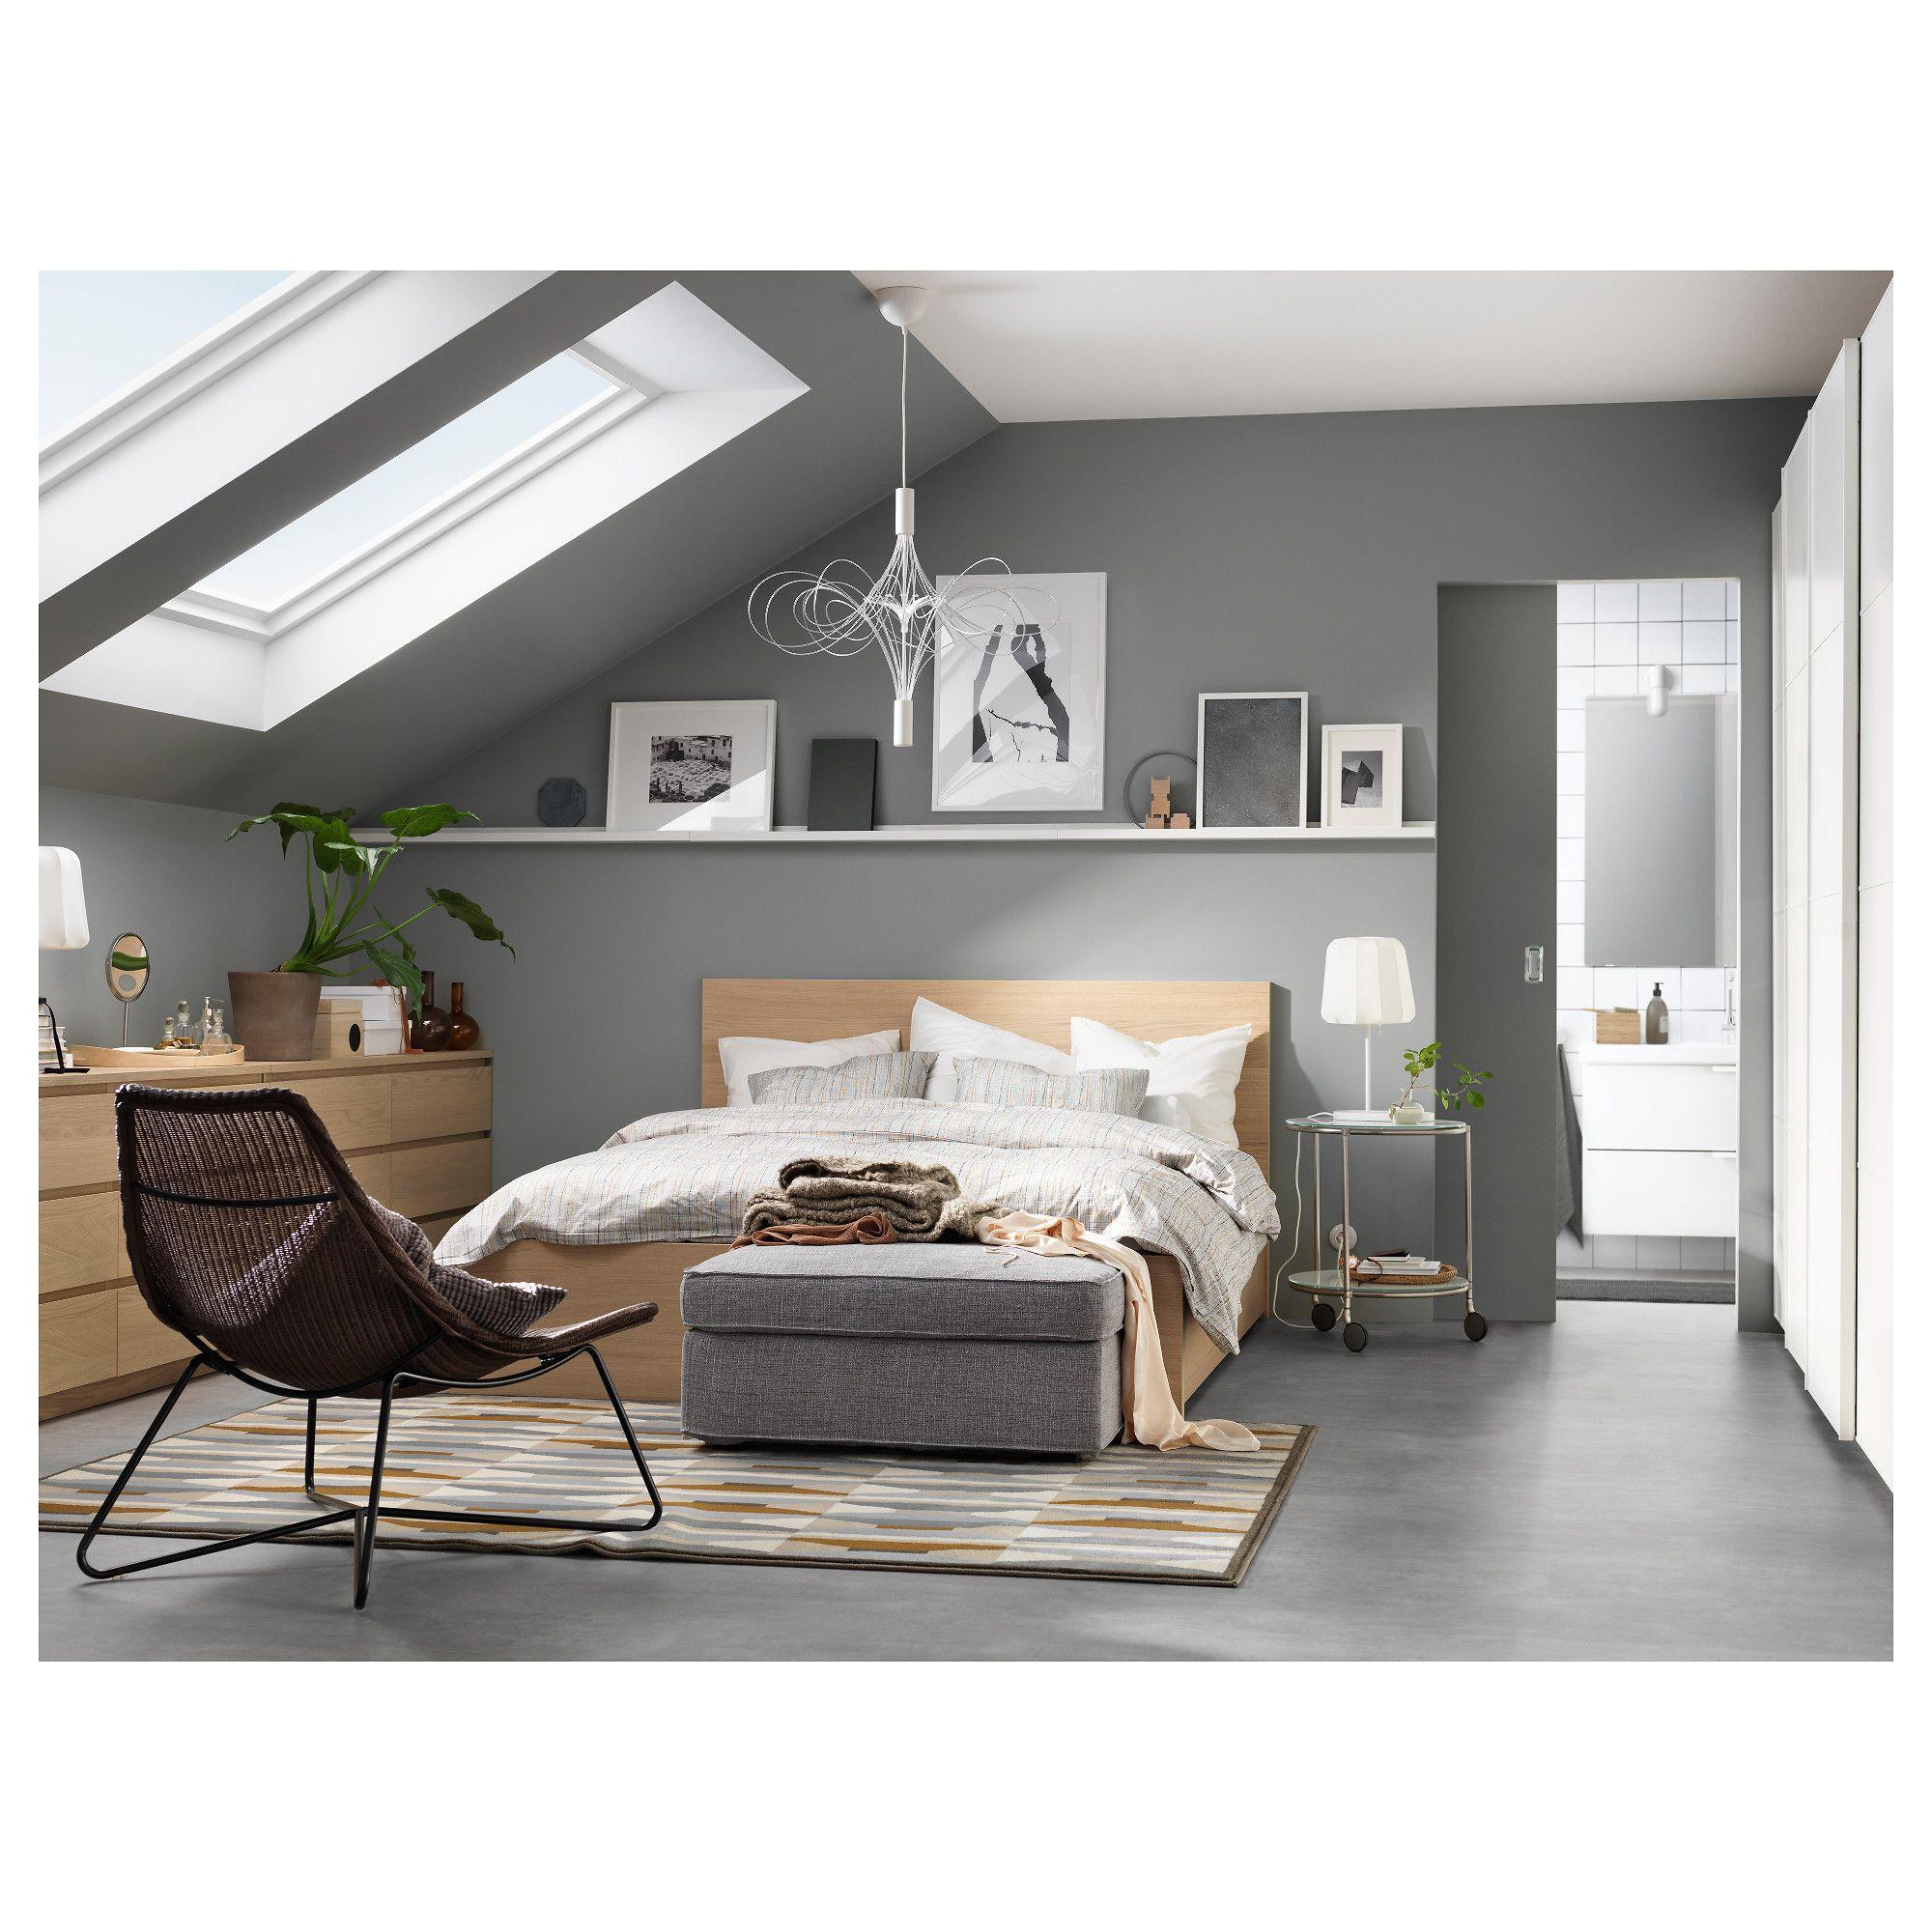 Malm High Bed Frame 2 Storage Boxes White Stained Oak Veneer Luroy Queen En 2020 Dormitorios Camas Decoracion De Muebles